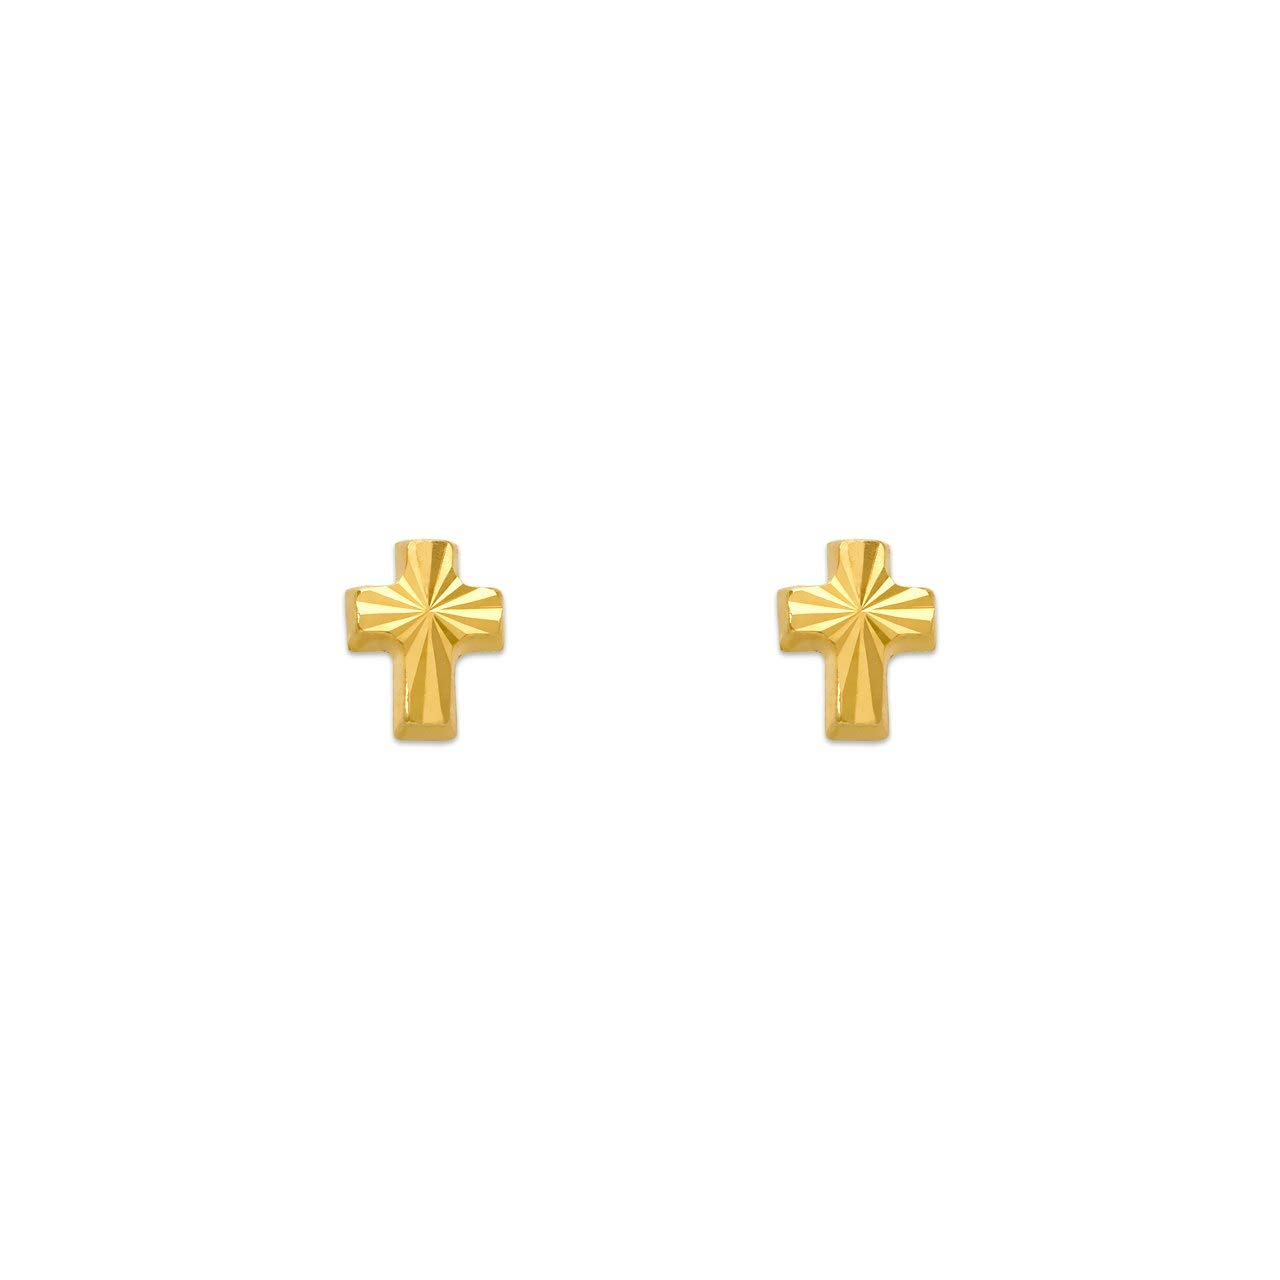 14K Gold Earrings High Polished DC Cross Stud Earrings Screwback